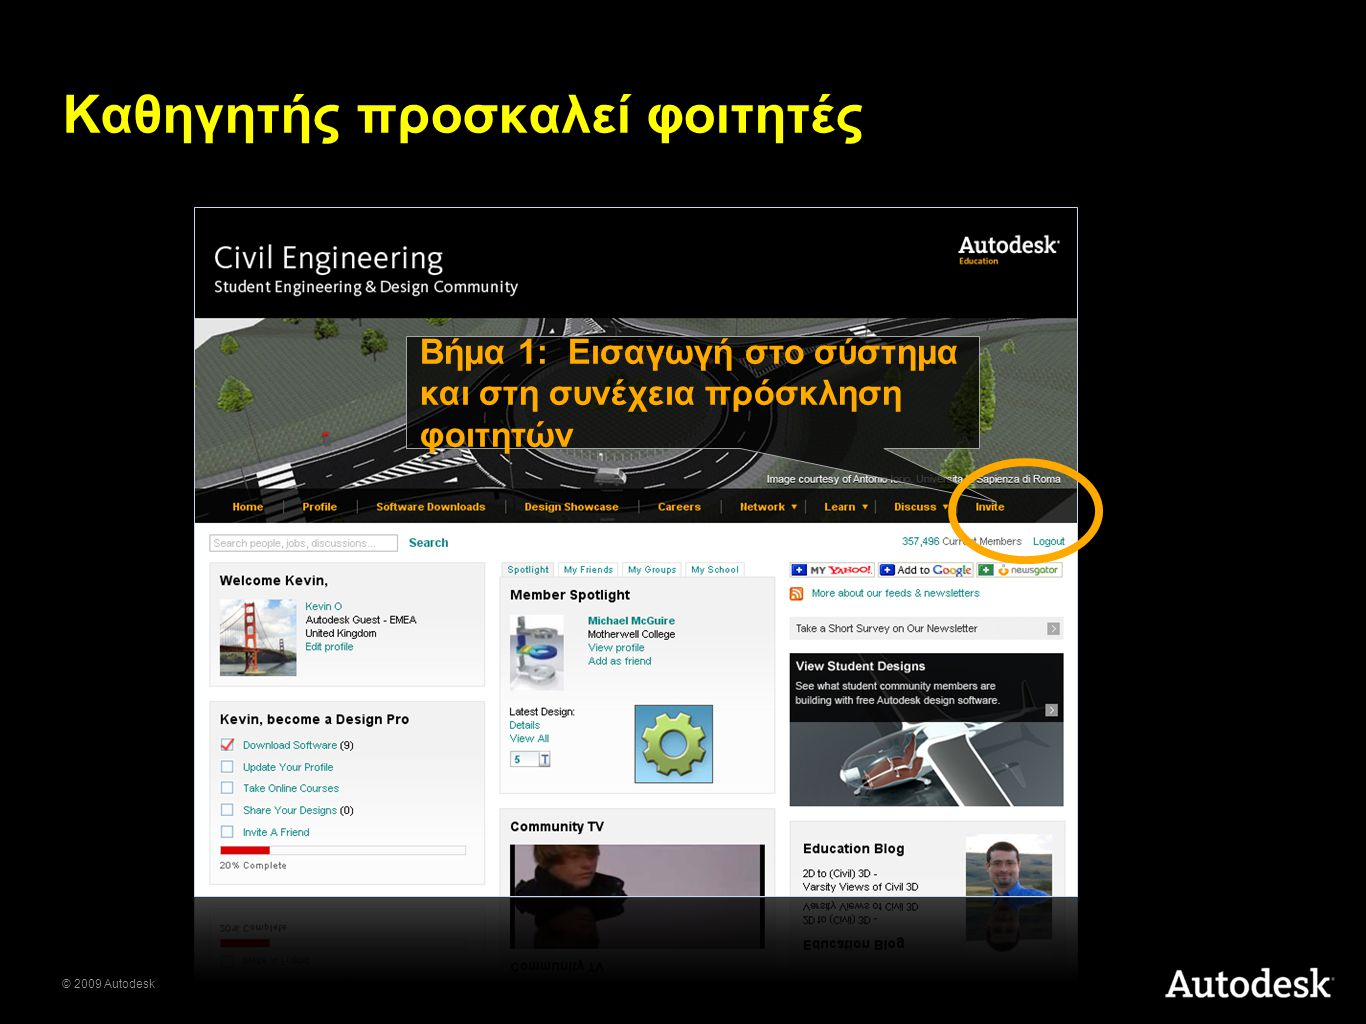 © 2009 Autodesk Καθηγητής προσκαλεί φοιτητές Βήμα 1: Εισαγωγή στο σύστημα και στη συνέχεια πρόσκληση φοιτητών